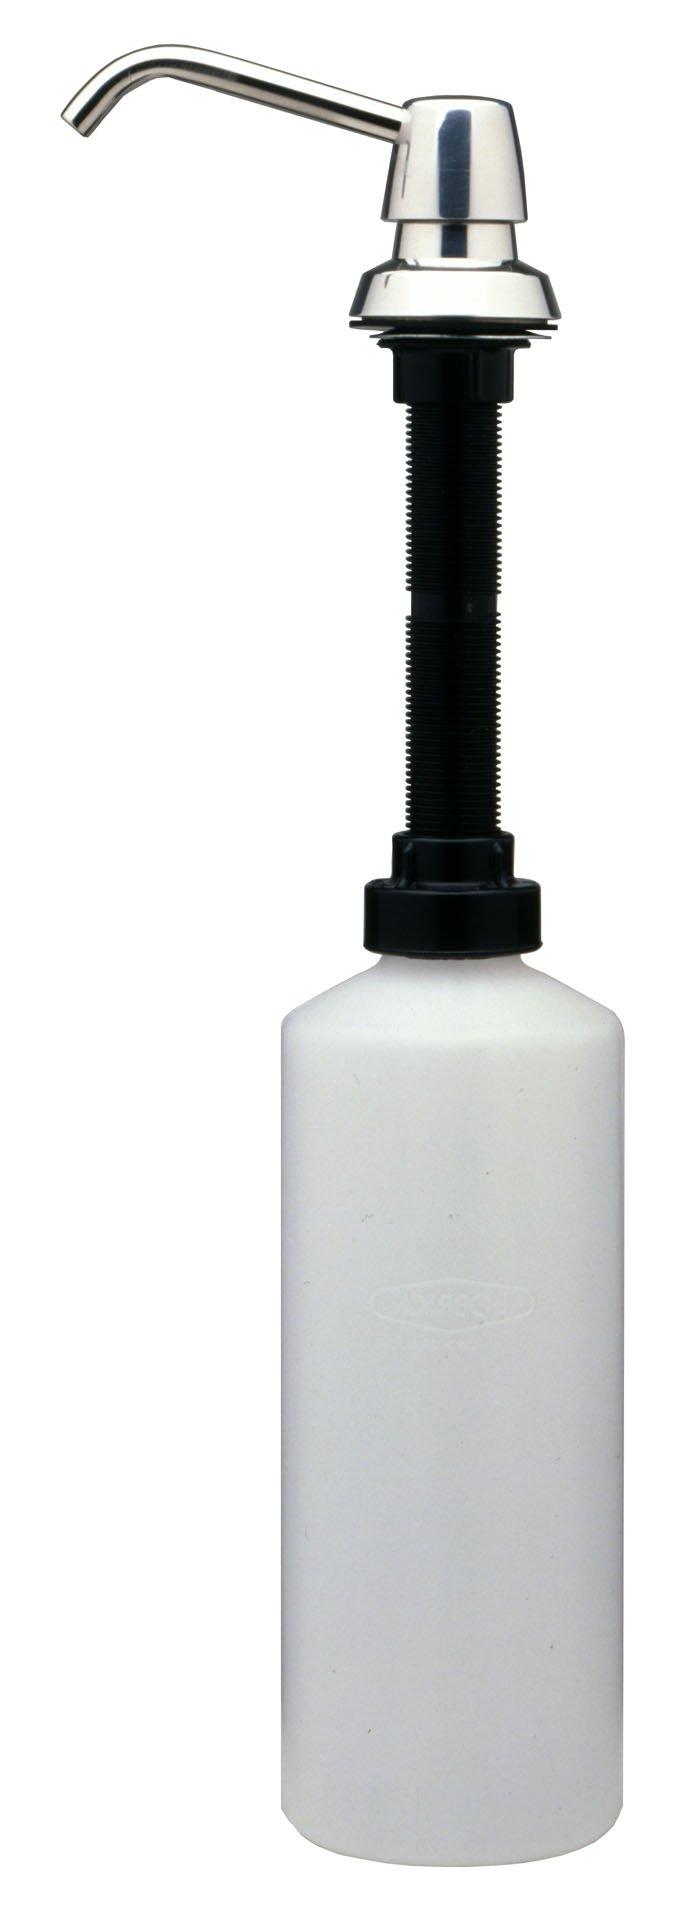 Bobrick B-822 Lavatory-Mounted Soap Dispenser, Stainless Steel